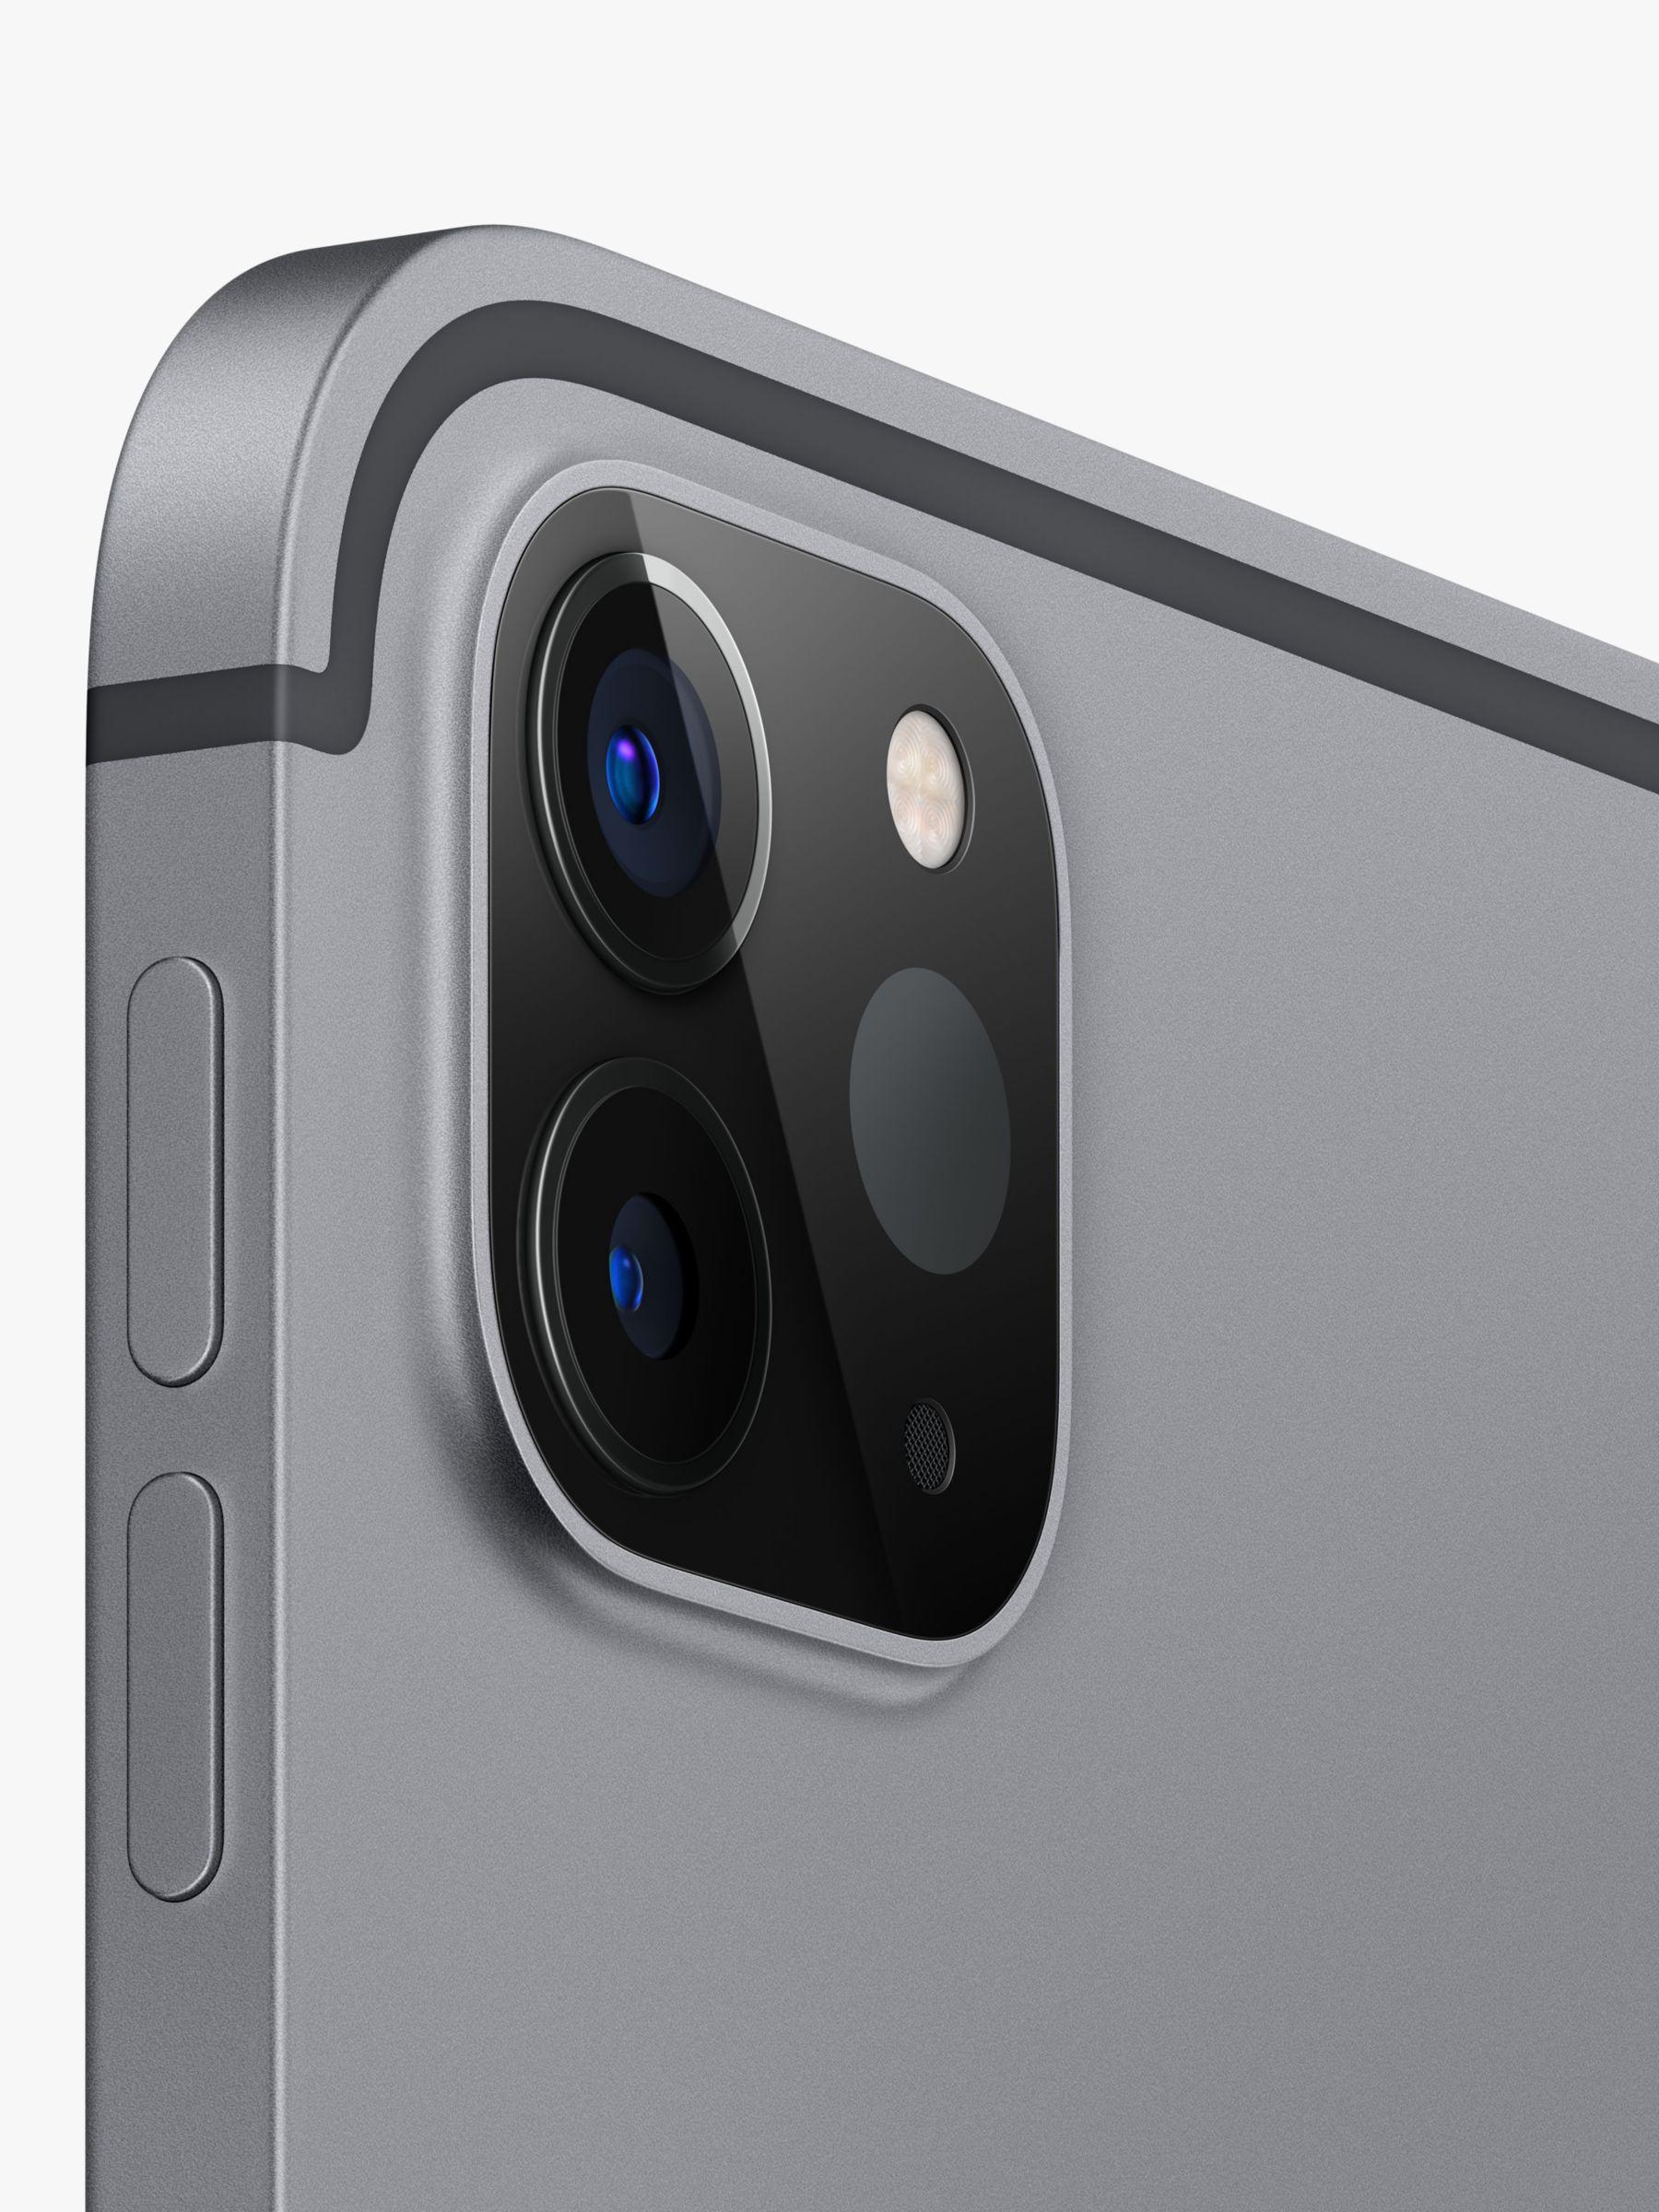 2020 Apple Ipad Pro 12 9 A12z Bionic Ios Wi Fi Cellular 256gb At John Lewis Partners